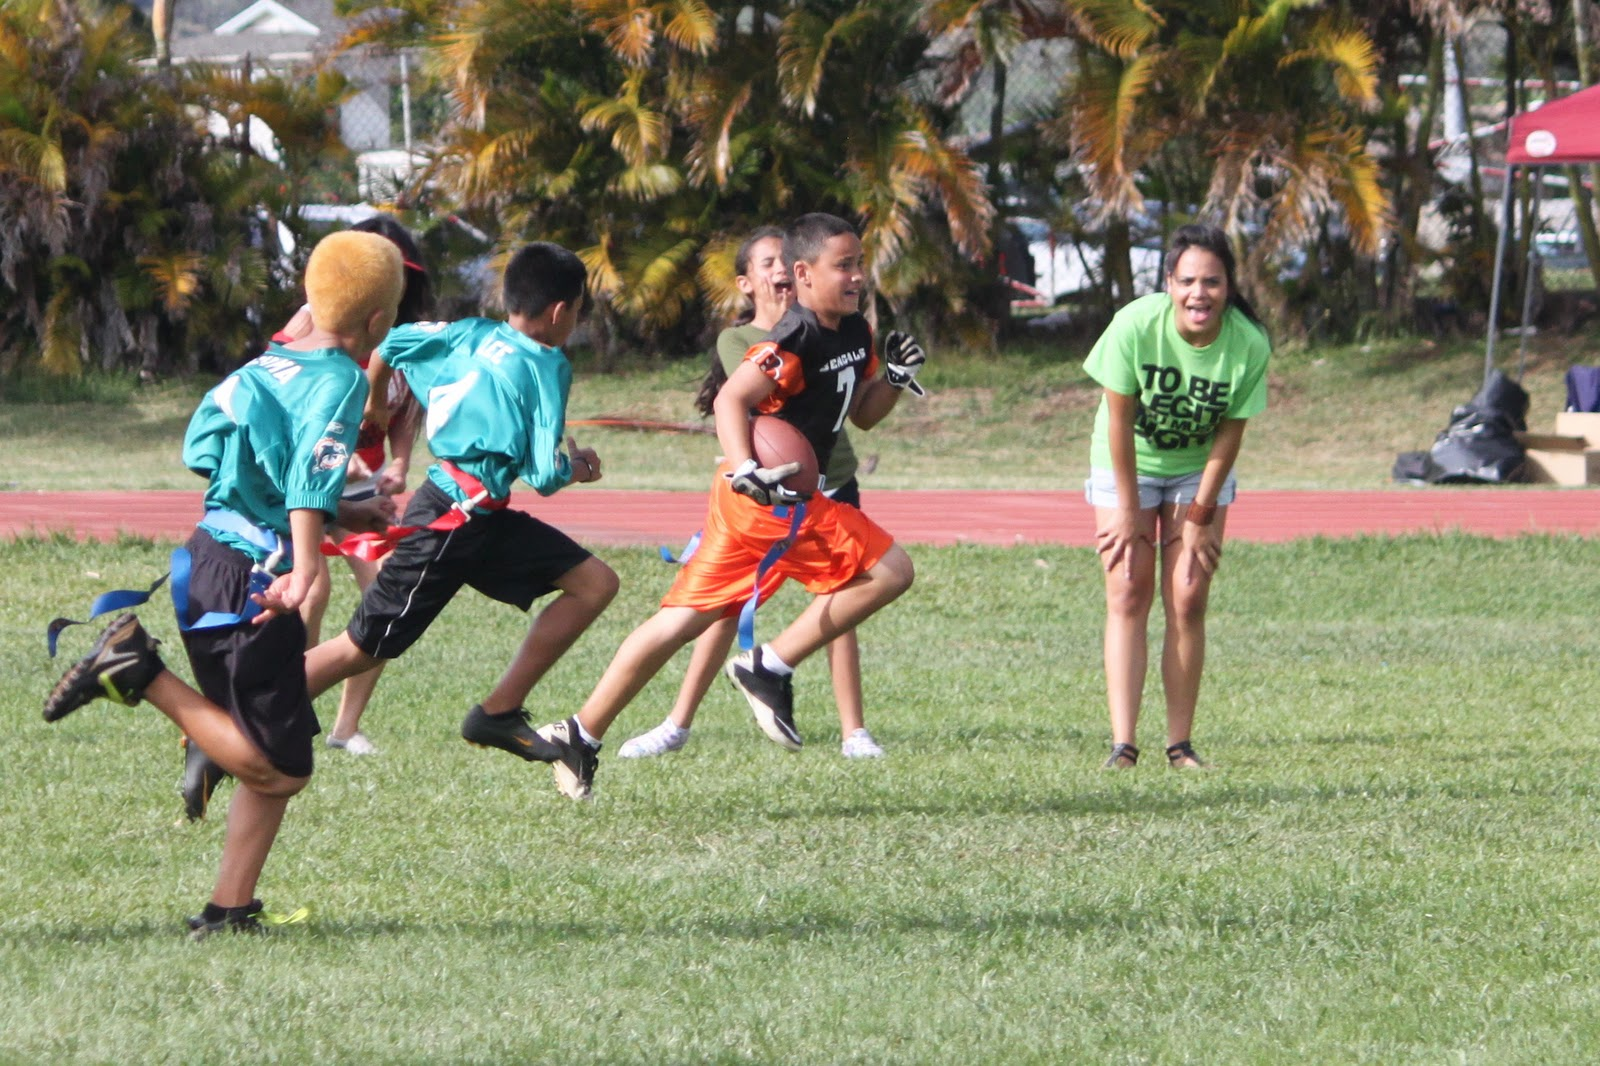 meet and play sports hawaii